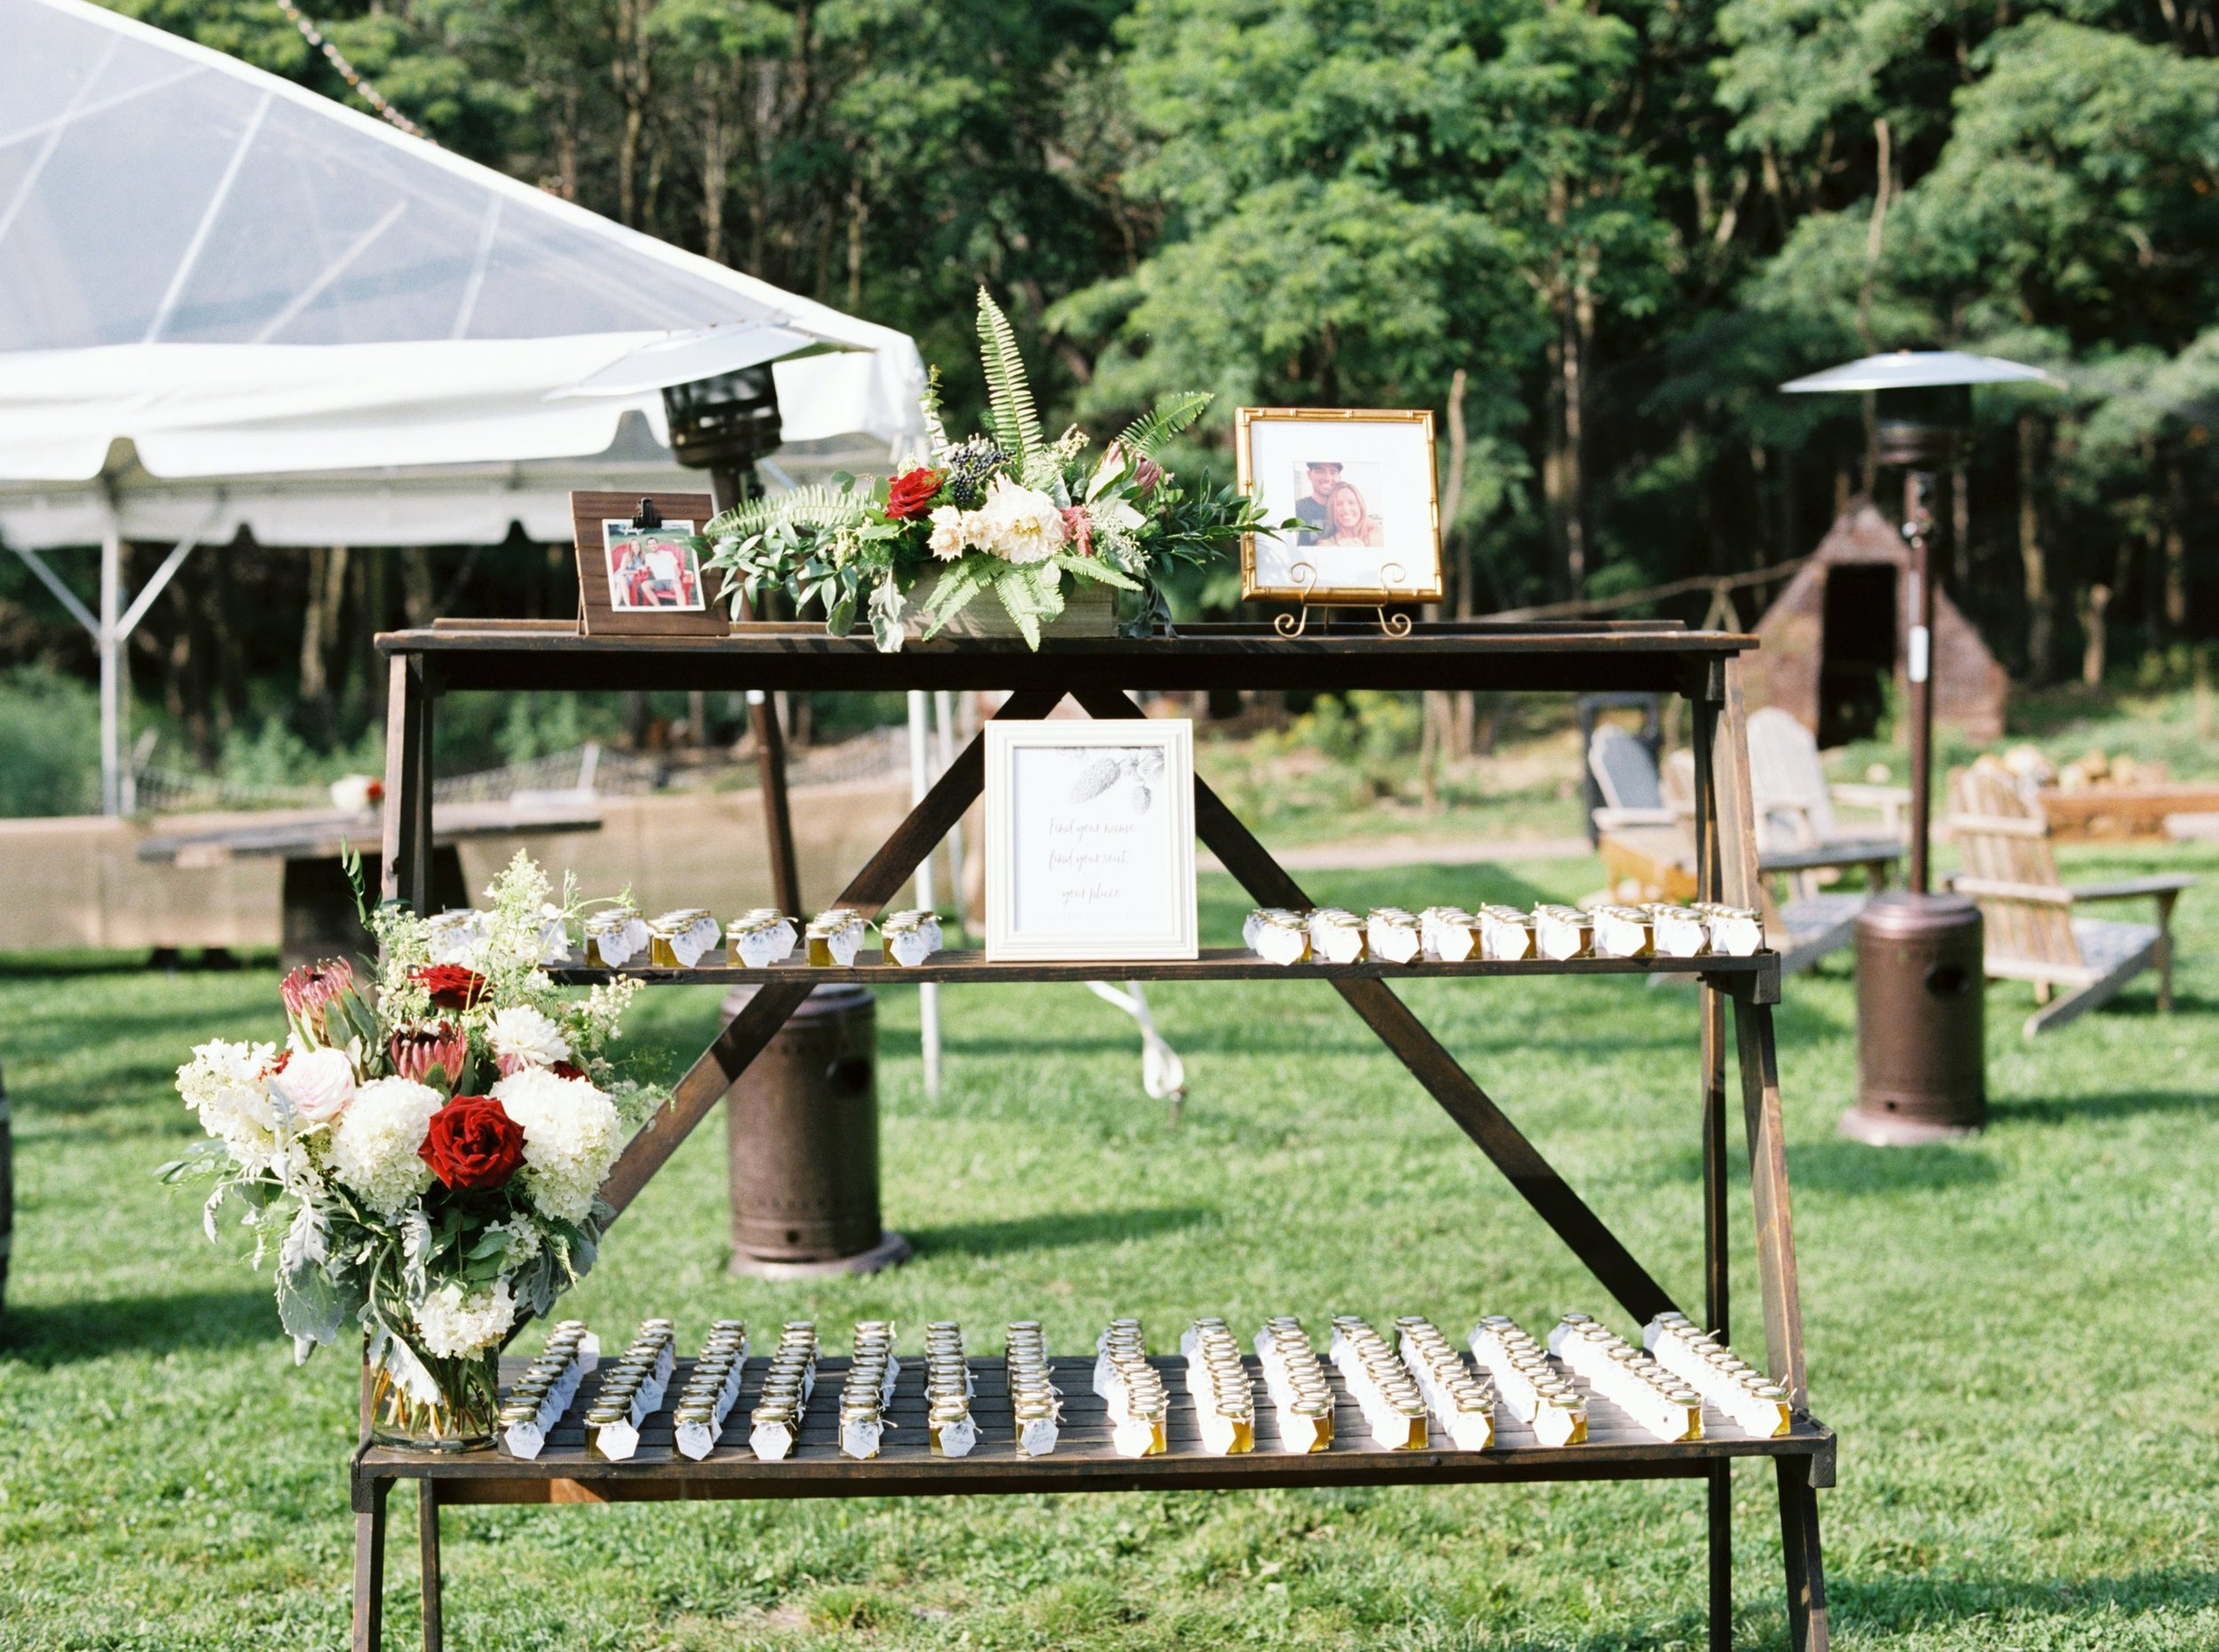 Courtney + Matt Blenheim Hill Farm Catskills NY Wedding Veronica Lola Photography 2017-328.jpg